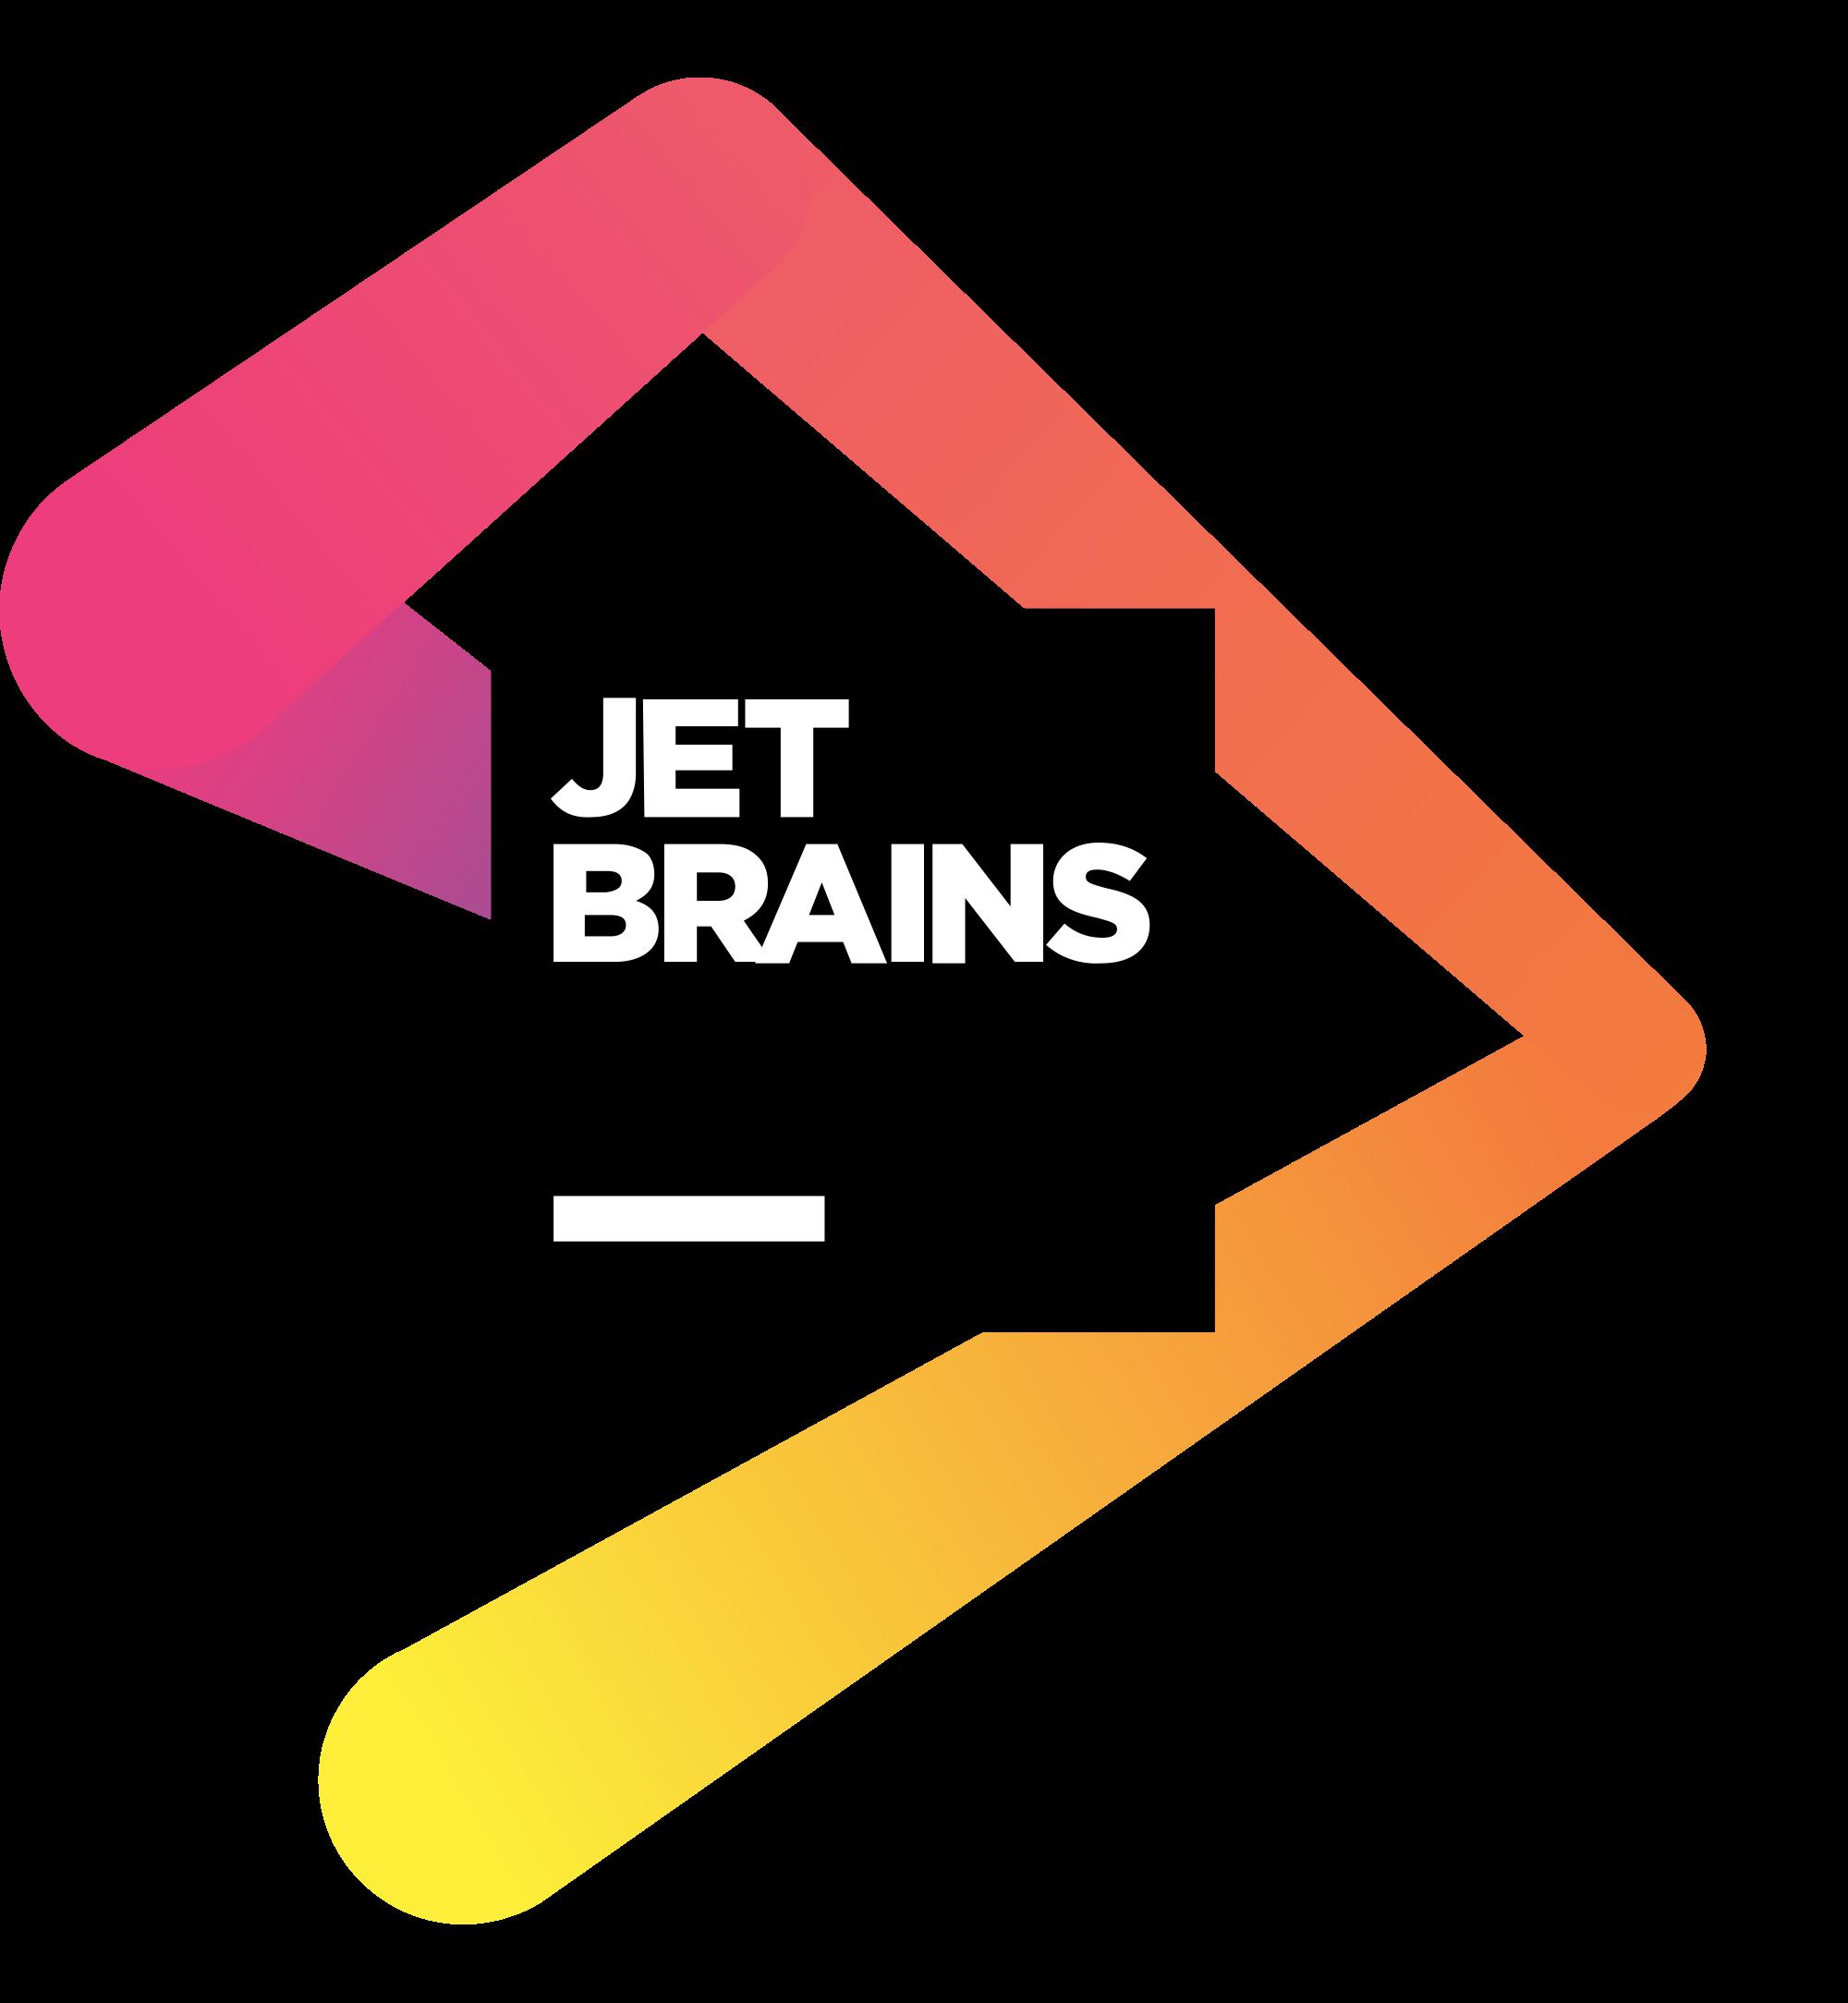 Thanks jetbrains